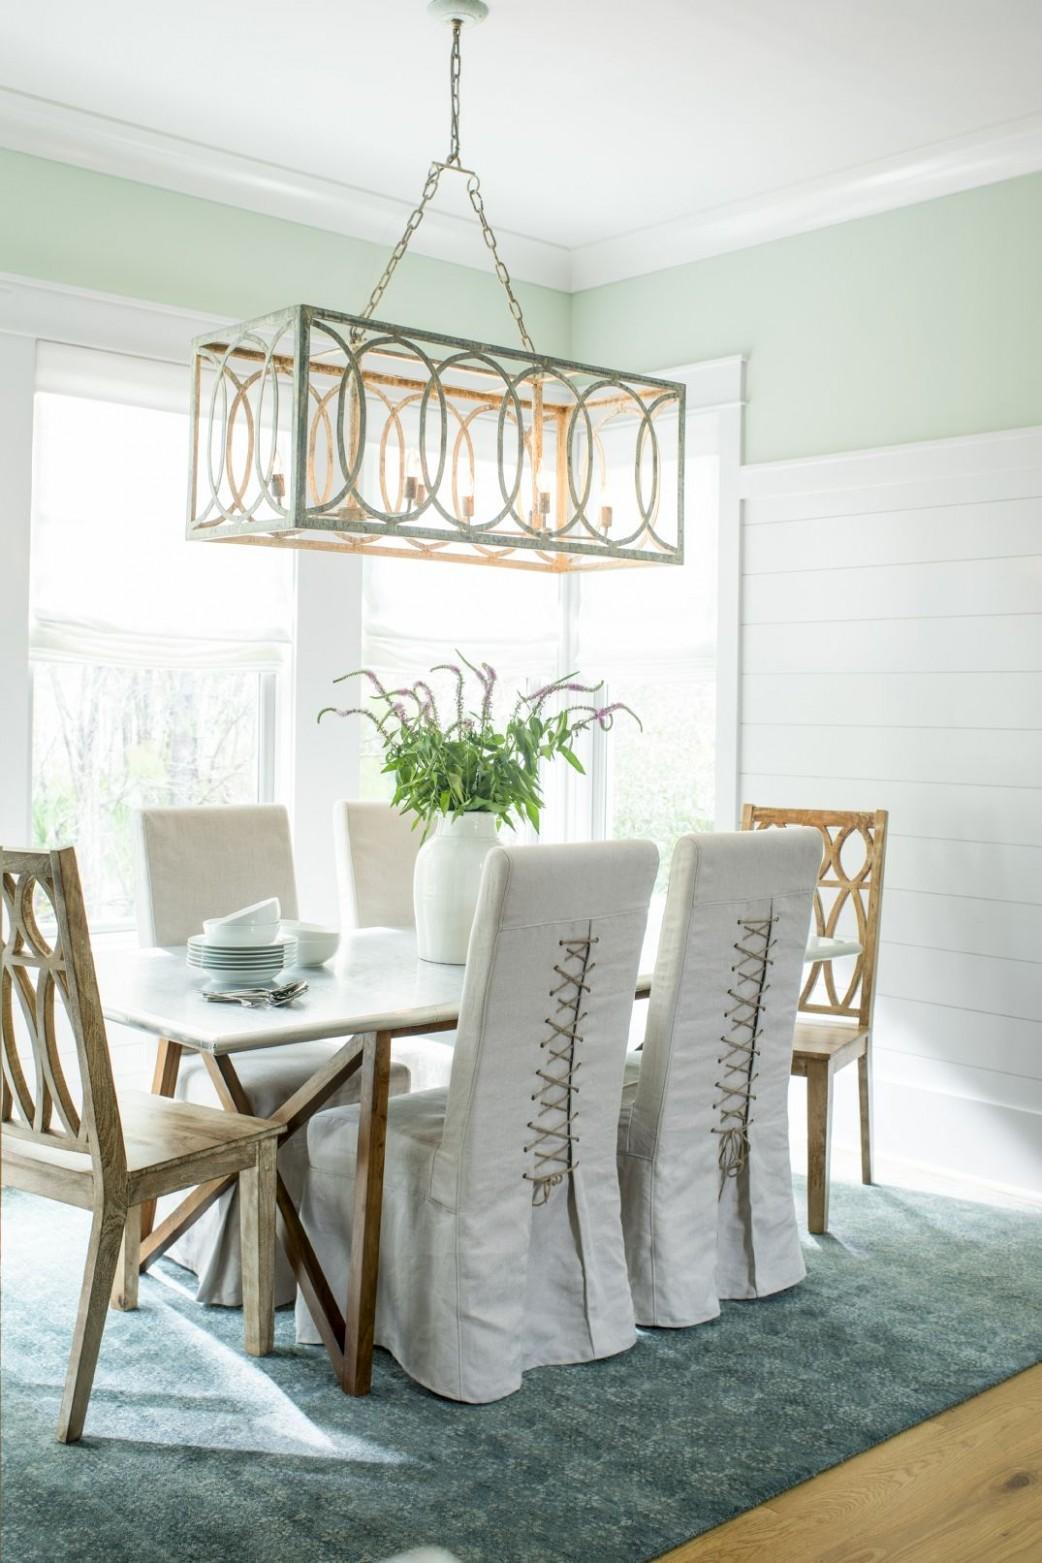 Dining Room Color Ideas & Inspiration  Benjamin Moore  Dining  - Dining Room Ideas Colour Schemes